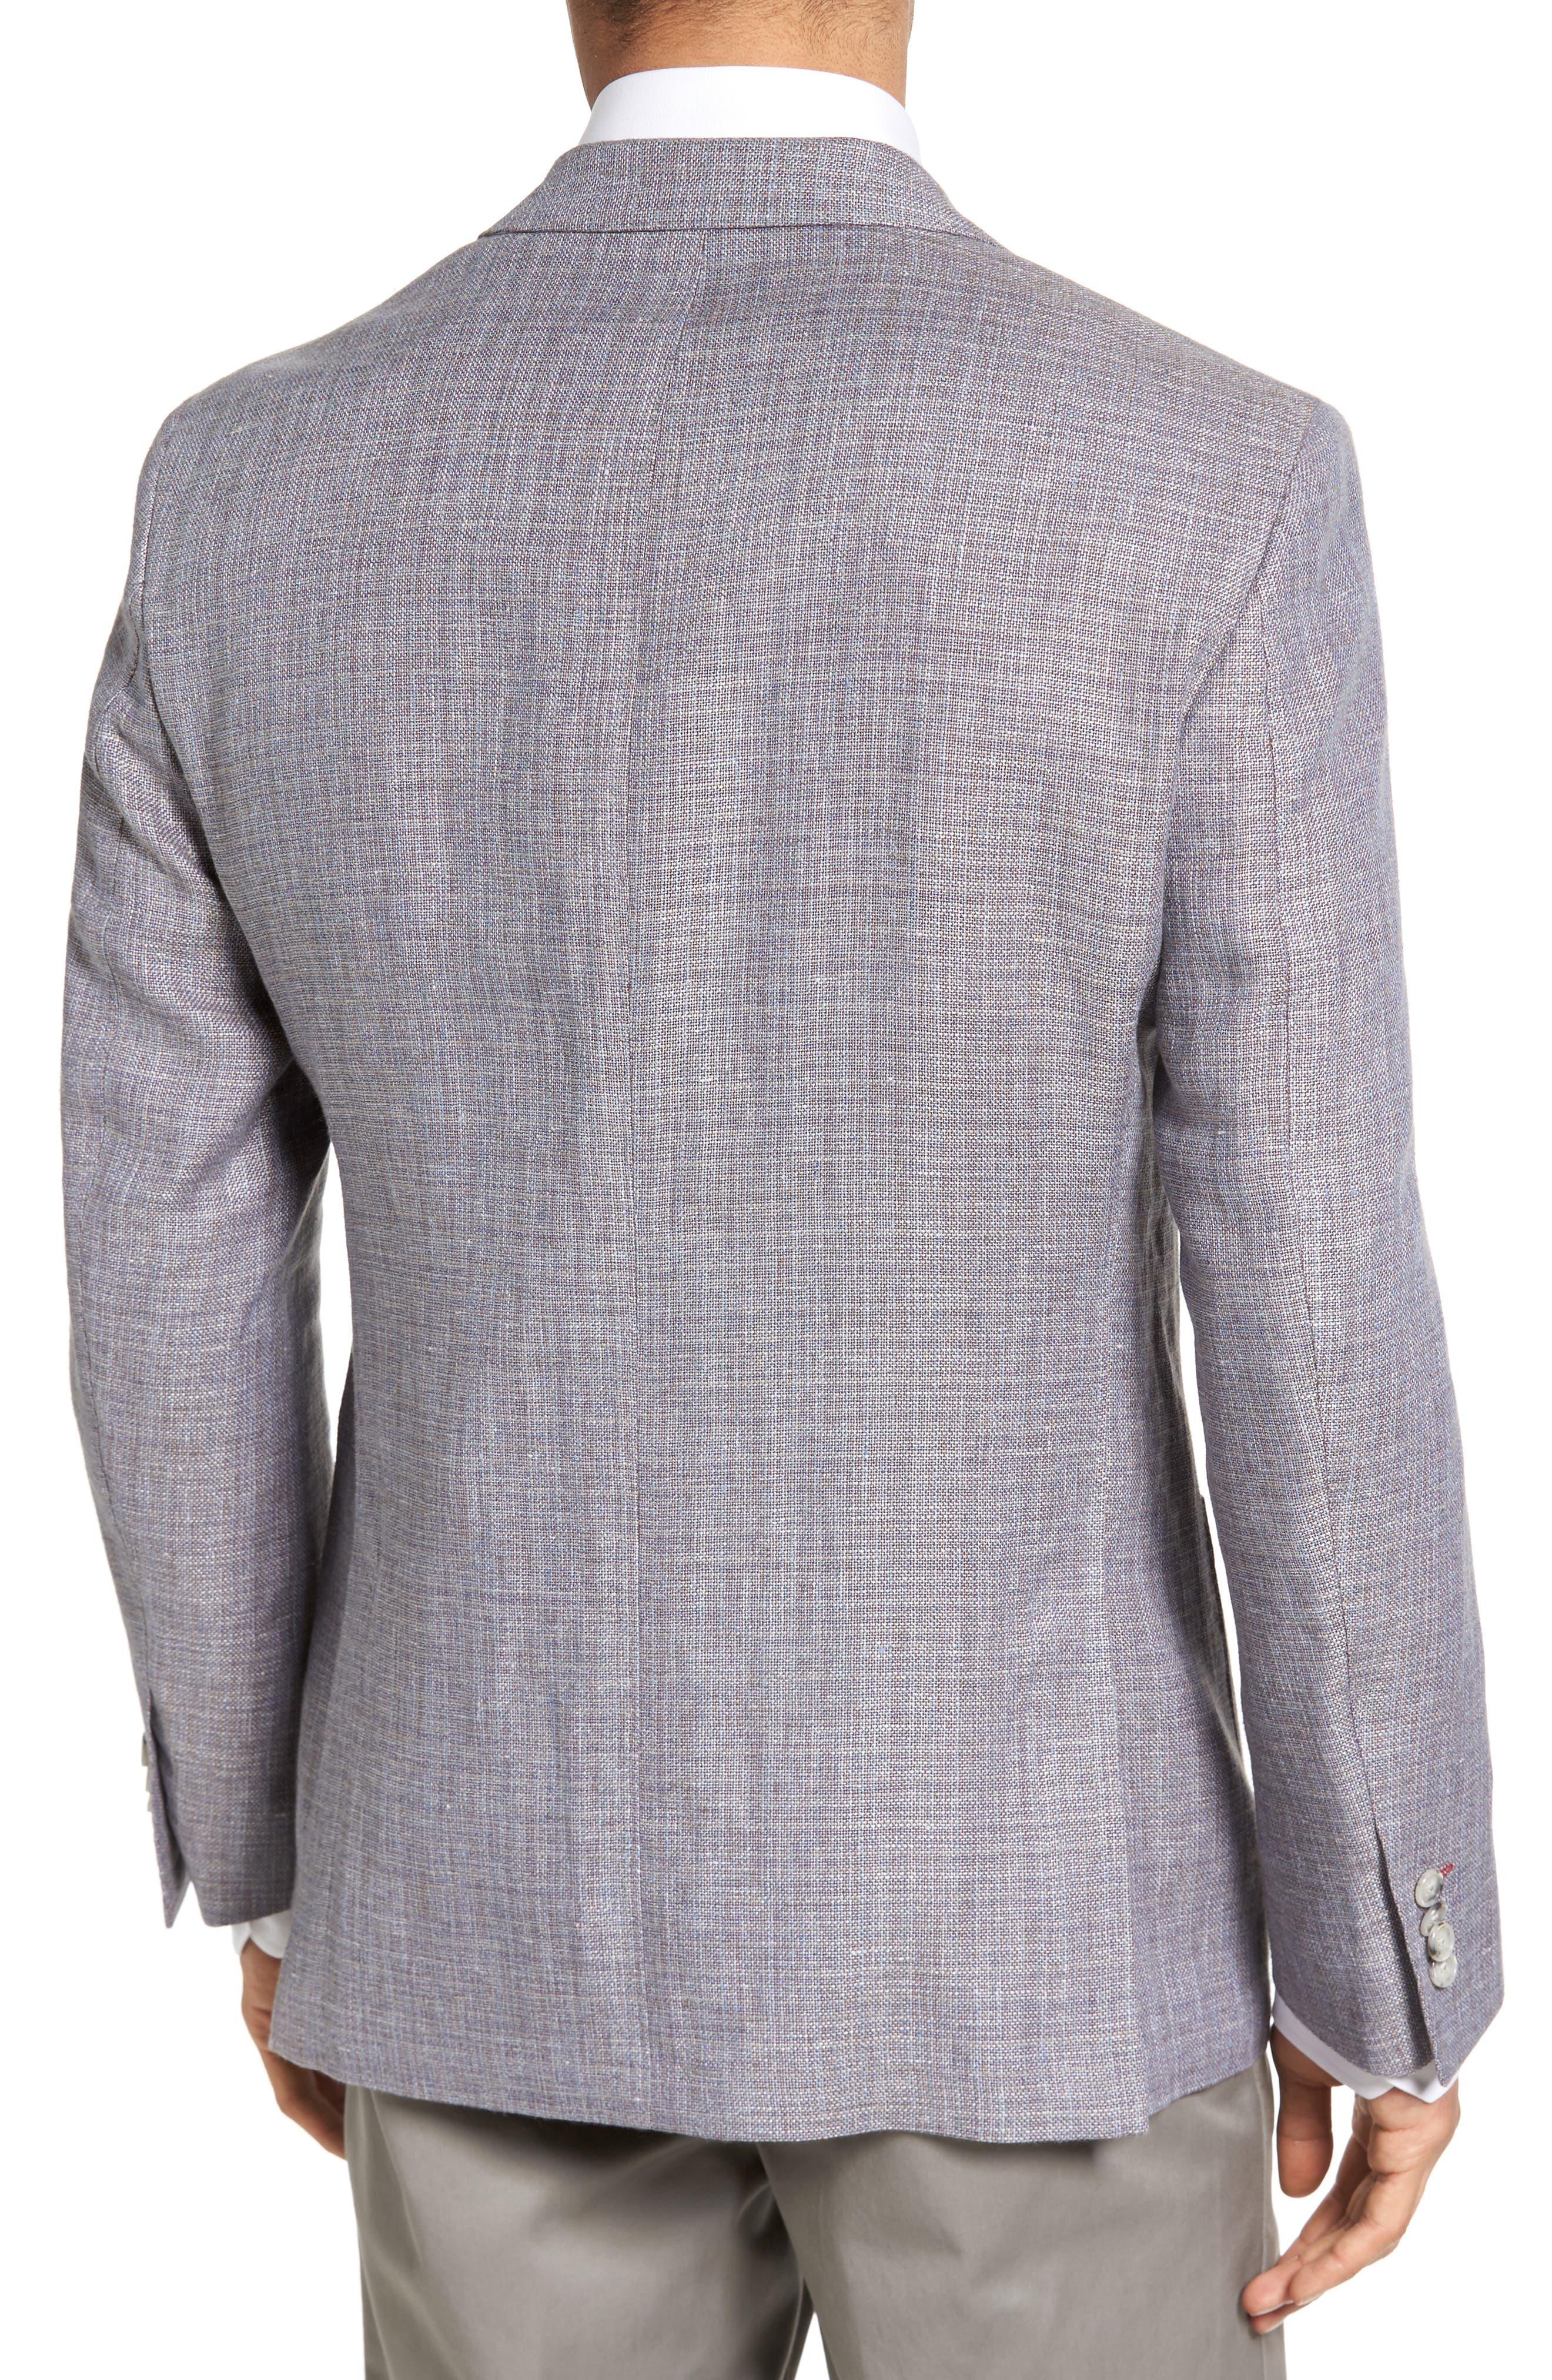 JKT NEW YORK,                             Trim Fit Wool & Linen Blazer,                             Alternate thumbnail 2, color,                             020